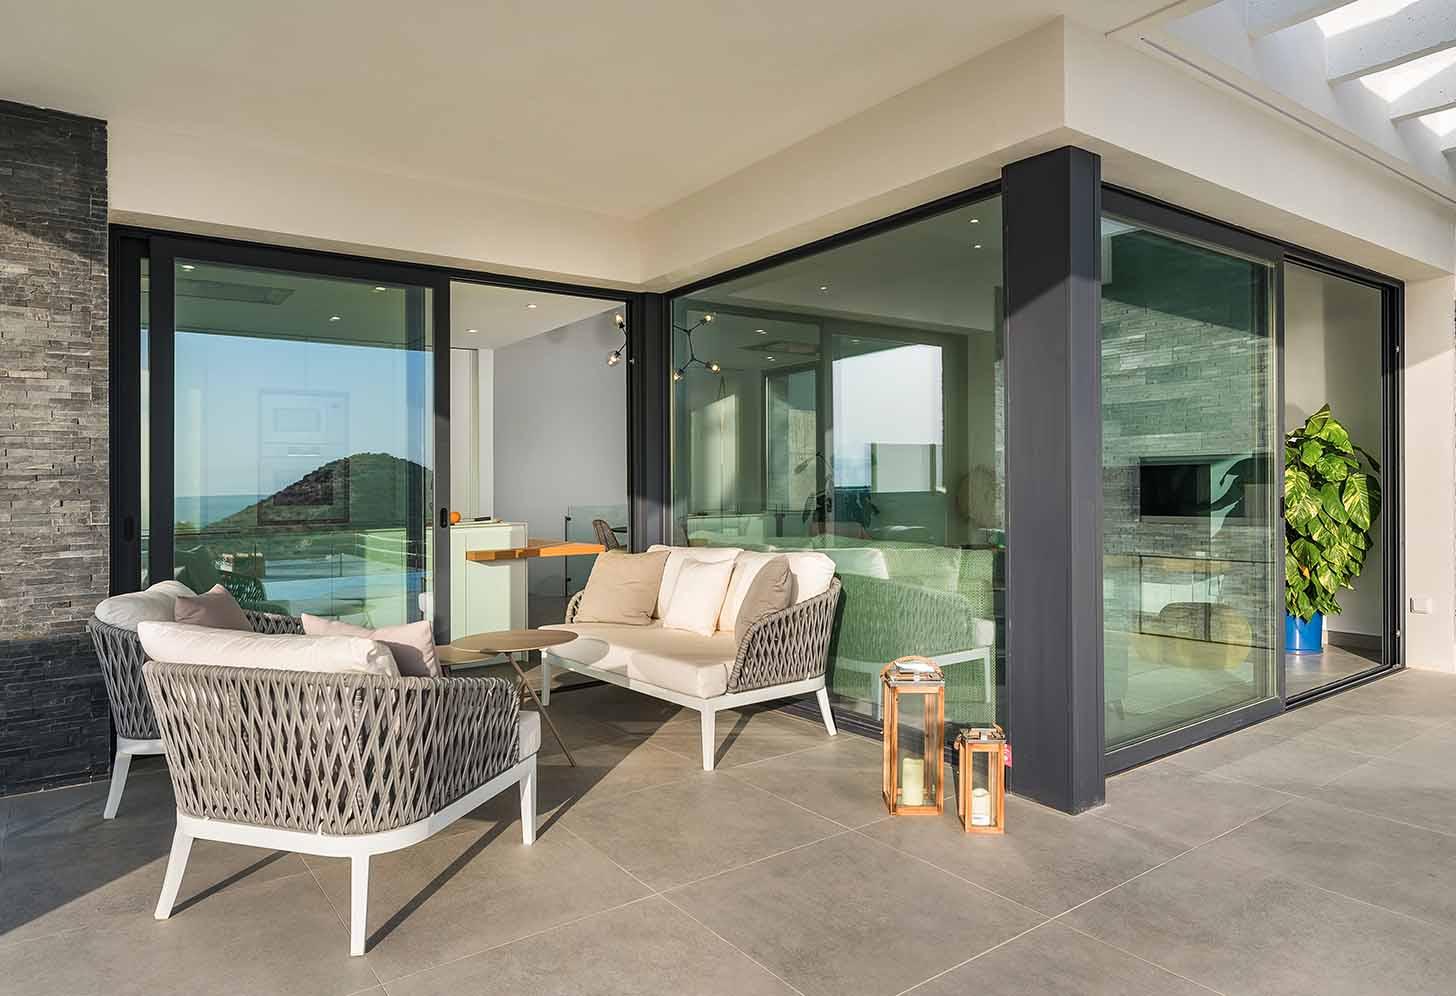 immobilier neuf espagne costa blanca sud alicante rojales terrasse